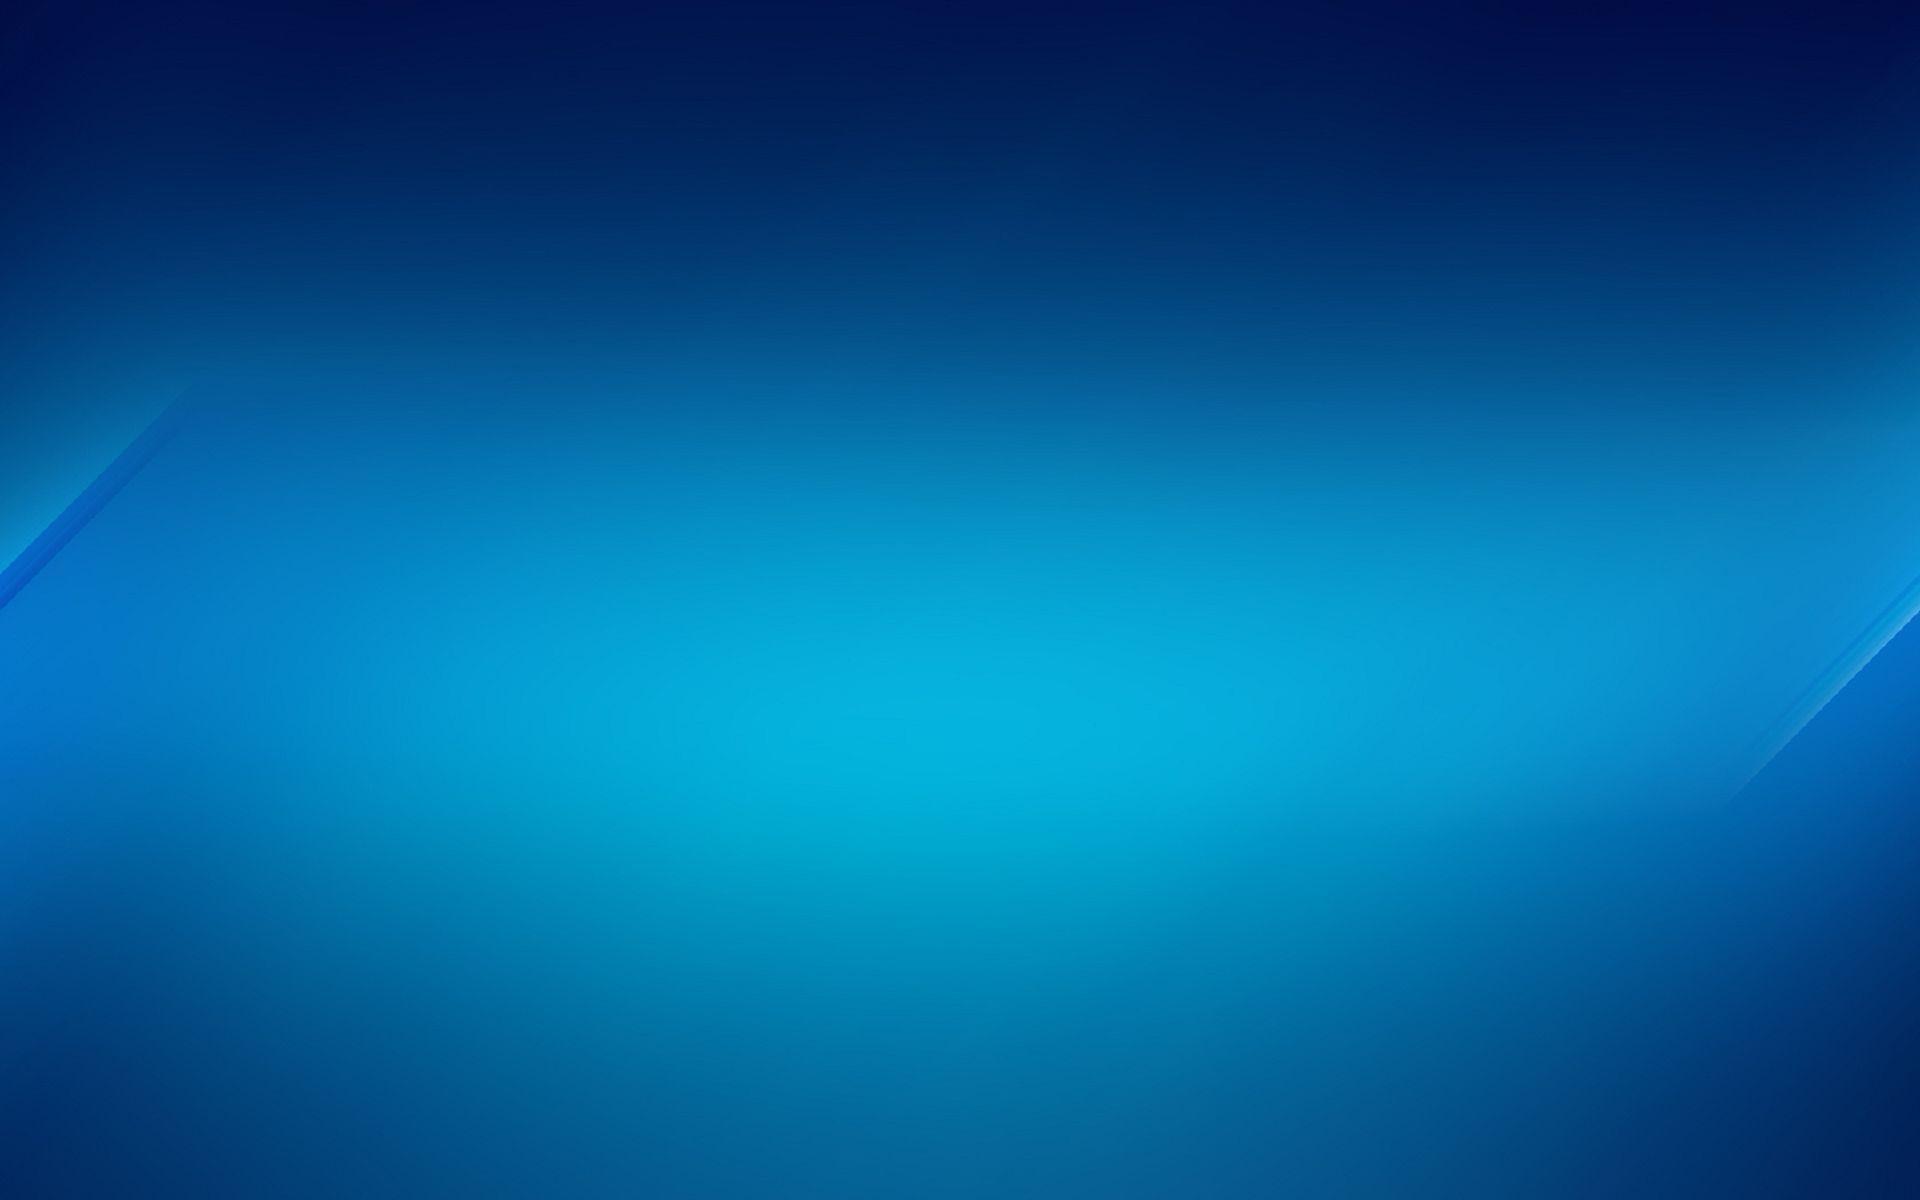 Blue Background   1916561 1920x1200